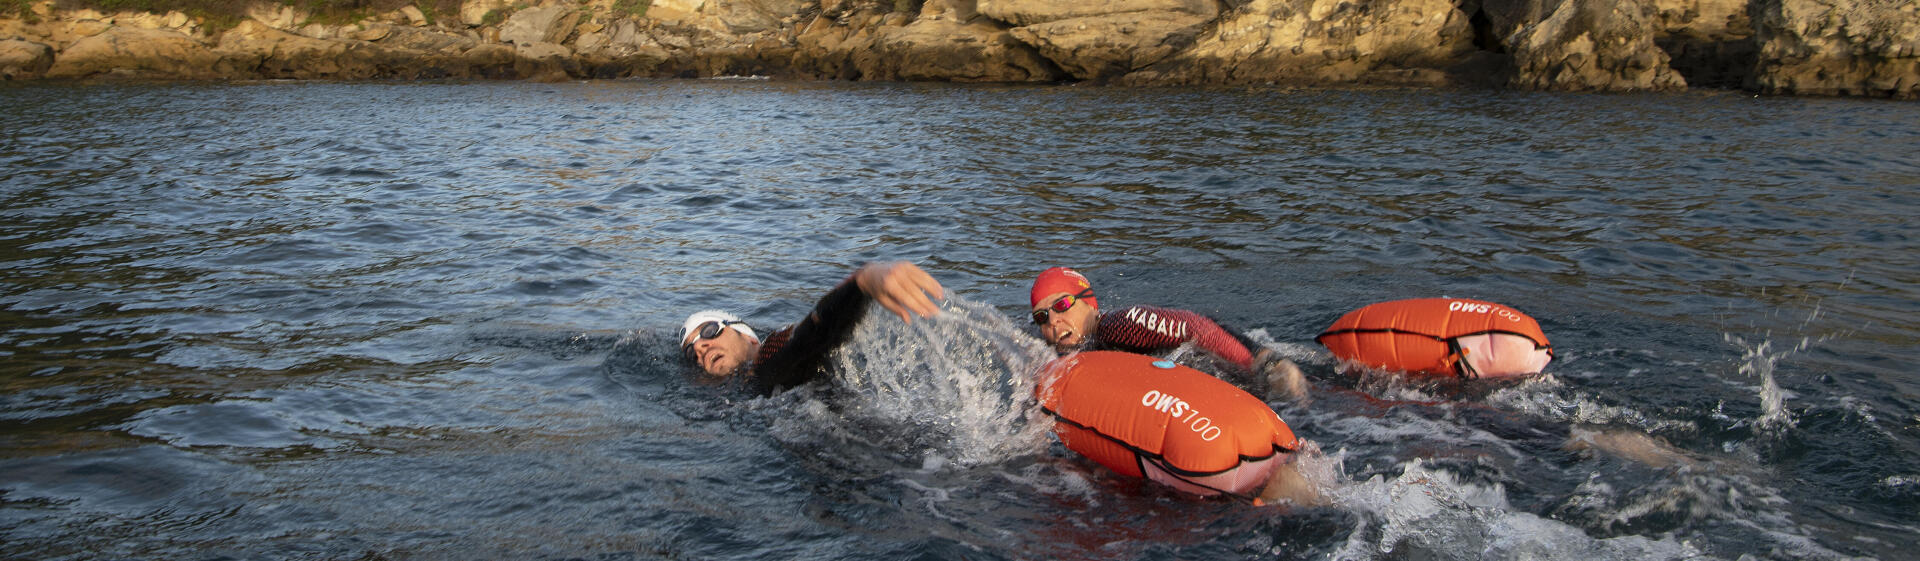 Natação Águas Abertas, Swim Run